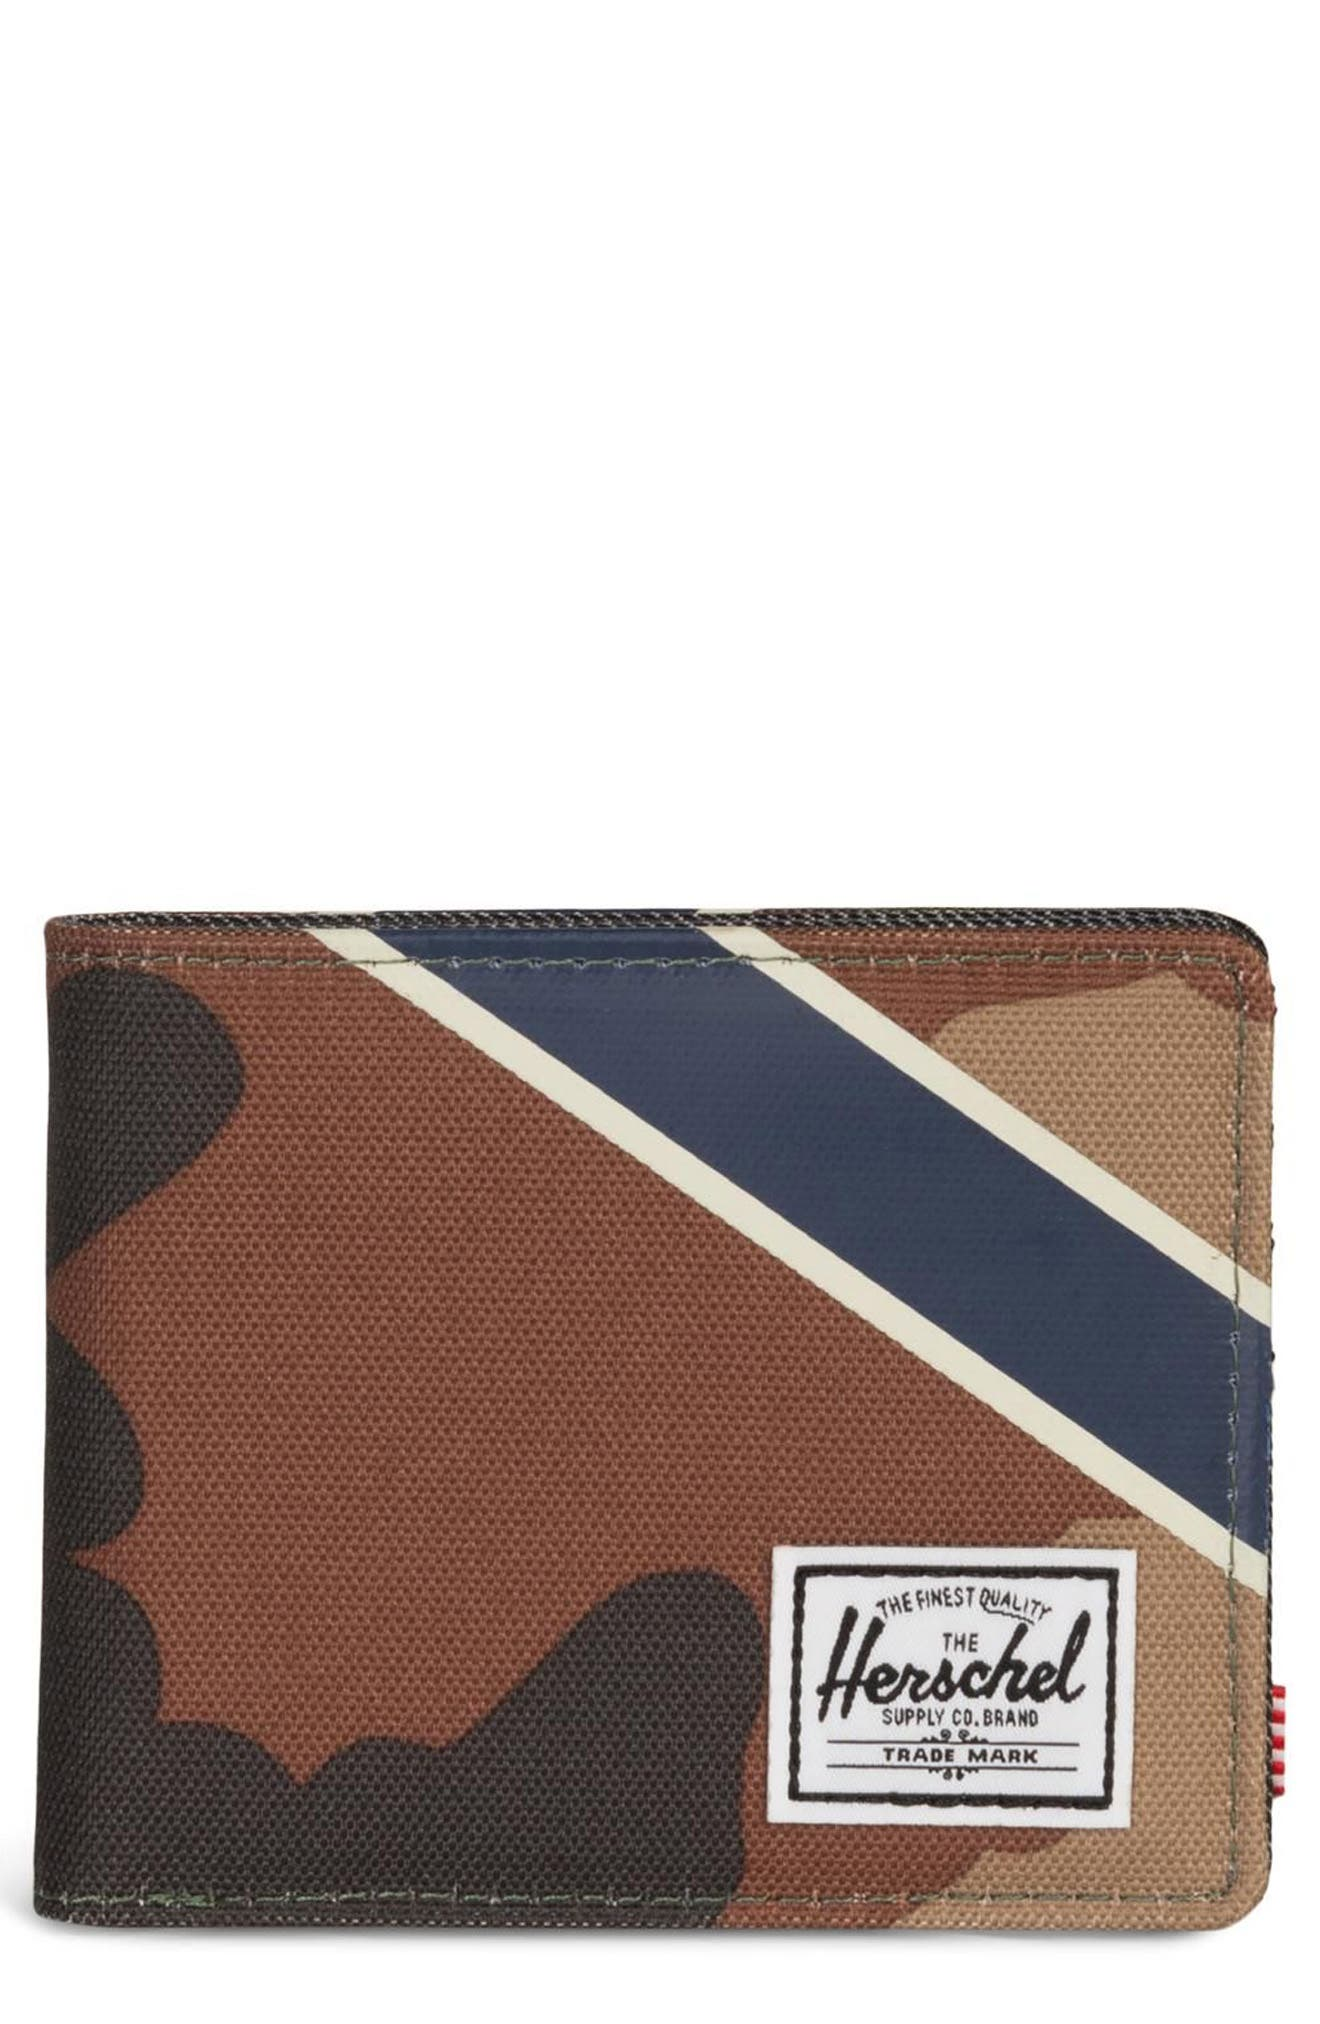 Roy Offset RFID Wallet,                             Main thumbnail 1, color,                             WOODLAND/ SILVER GREEN/ DENIM